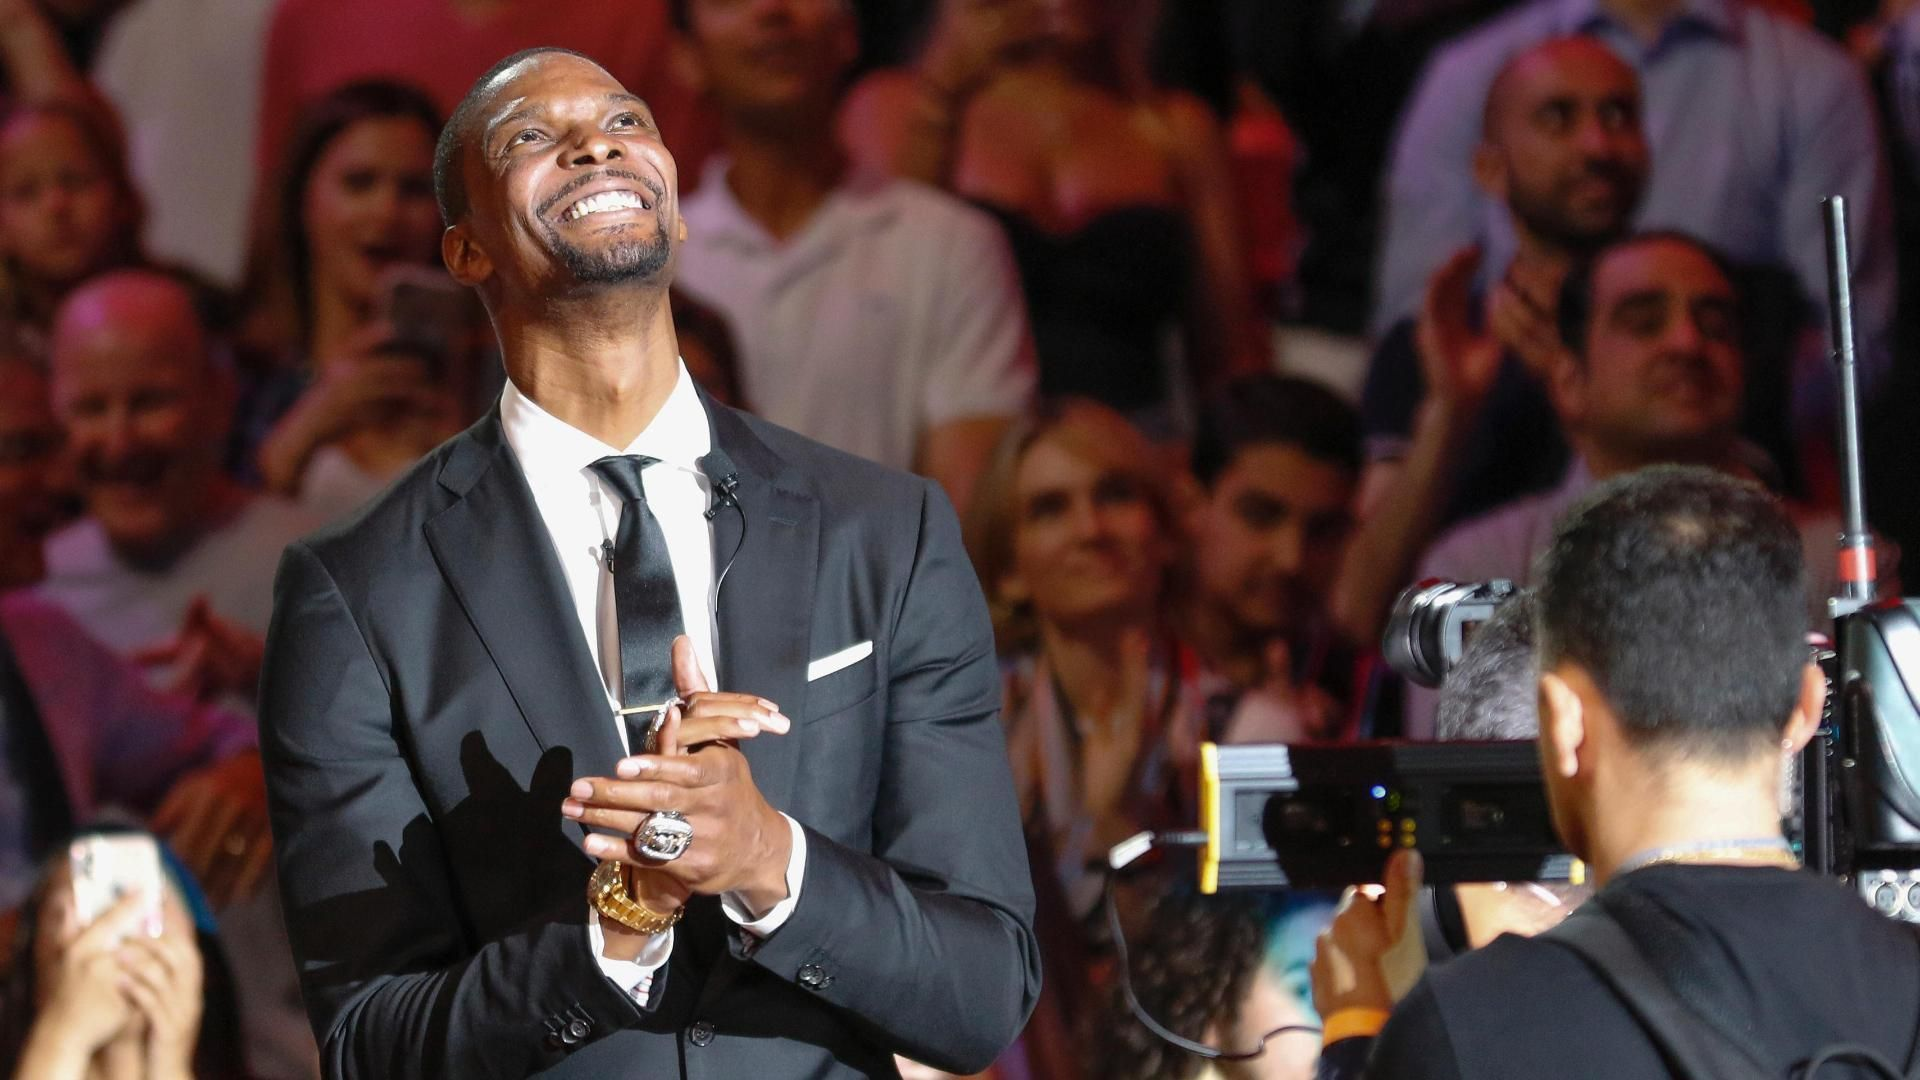 Magic win 6th straight, top Heat 104-99 in East showdown